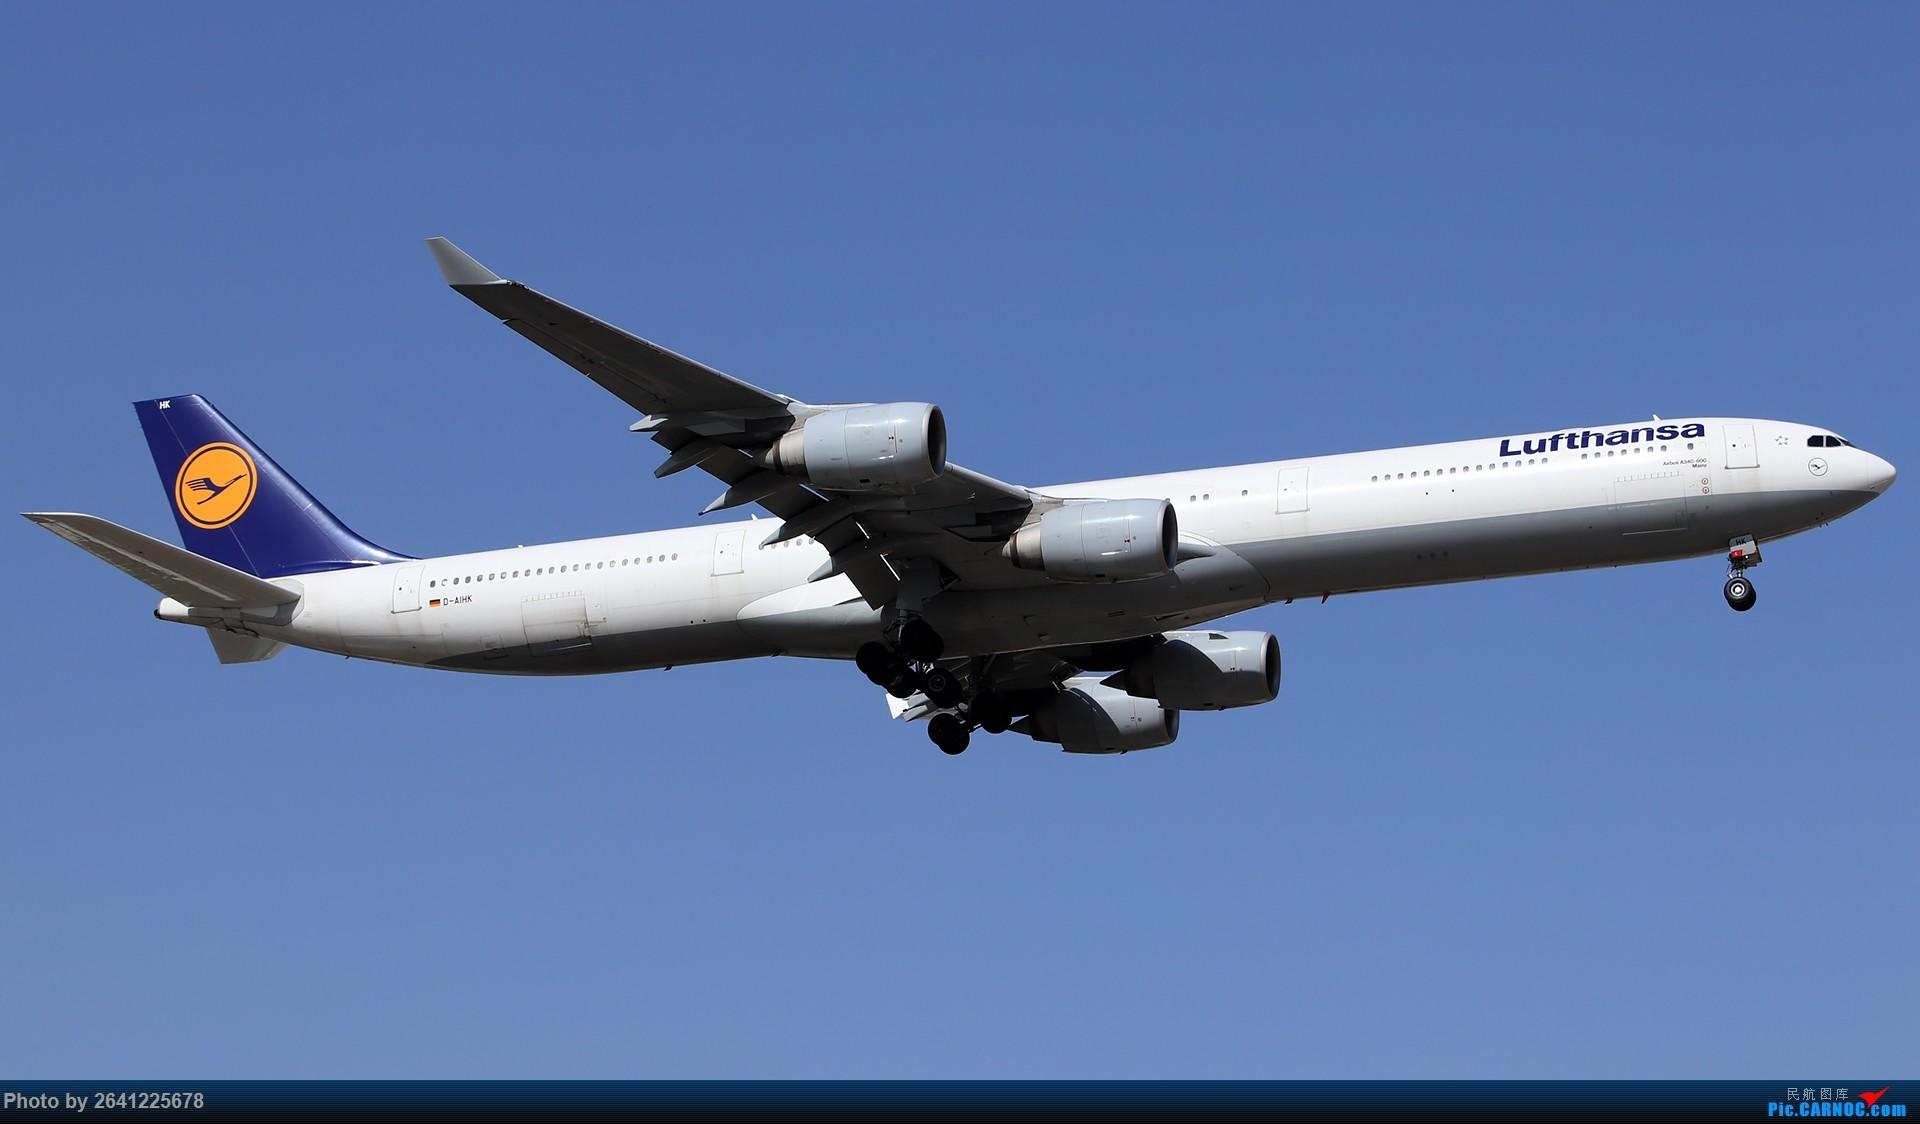 Re:[原创]【测评】腾龙70-210mm F/4 (A034)试拍 AIRBUS A340-600 D-AIHK 中国北京首都国际机场